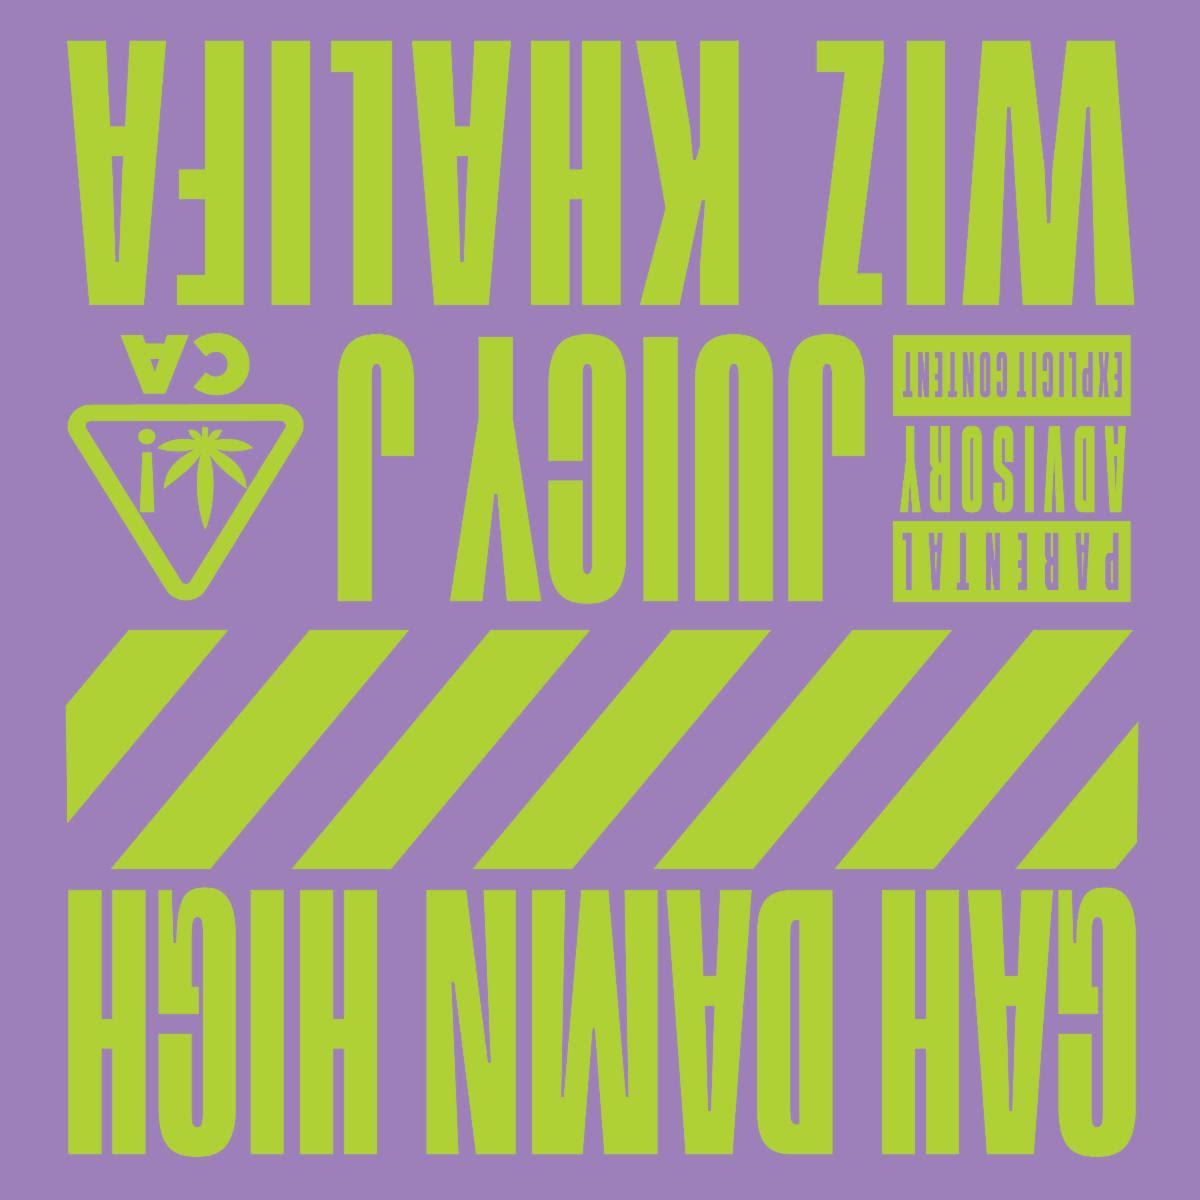 juicy j gah damn high single artwork Juicy J Announces Star Studded Album The Hustle Continues, Gets Gah Damn High On New Single: Stream